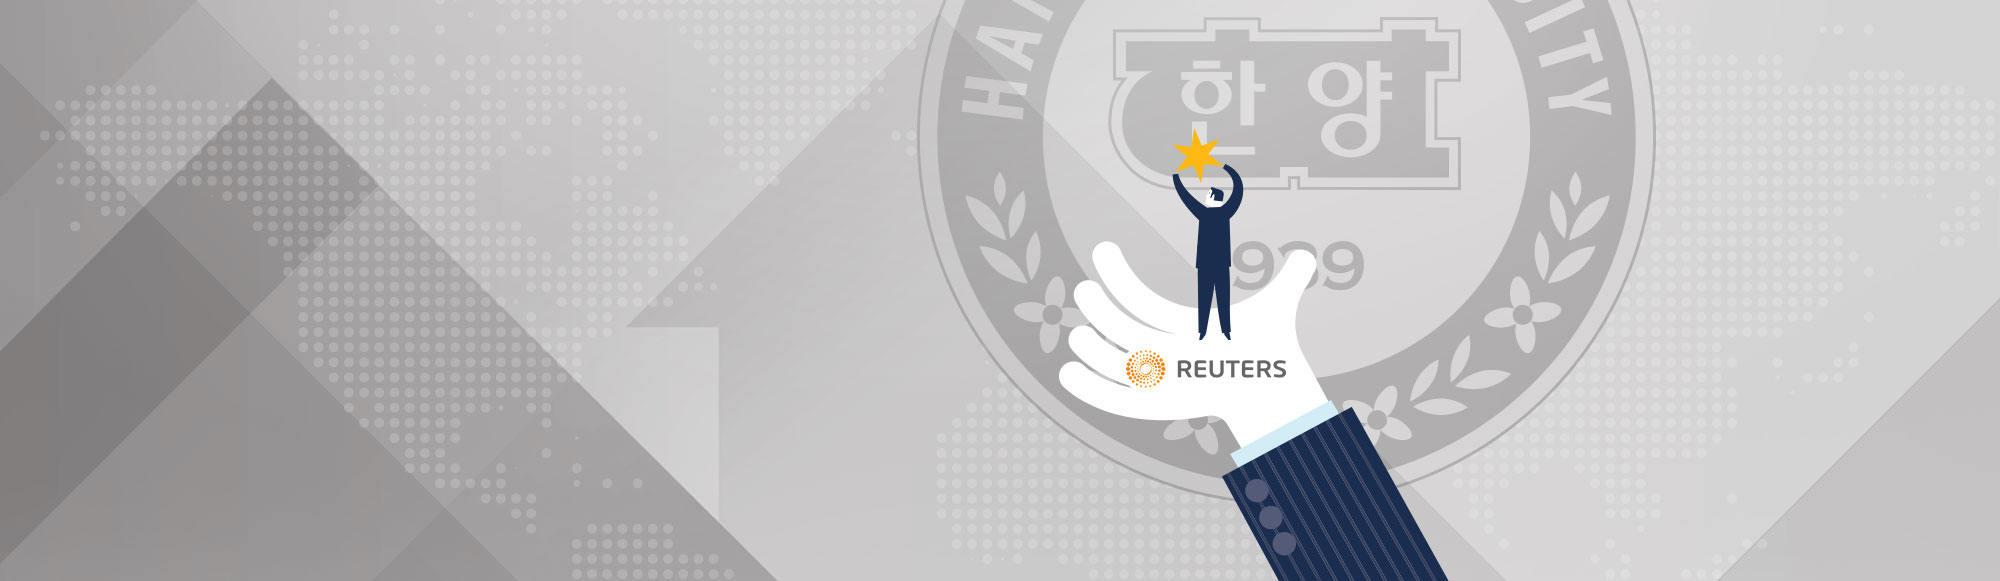 Reuters 2017<br> 아시아 최고 혁신대학